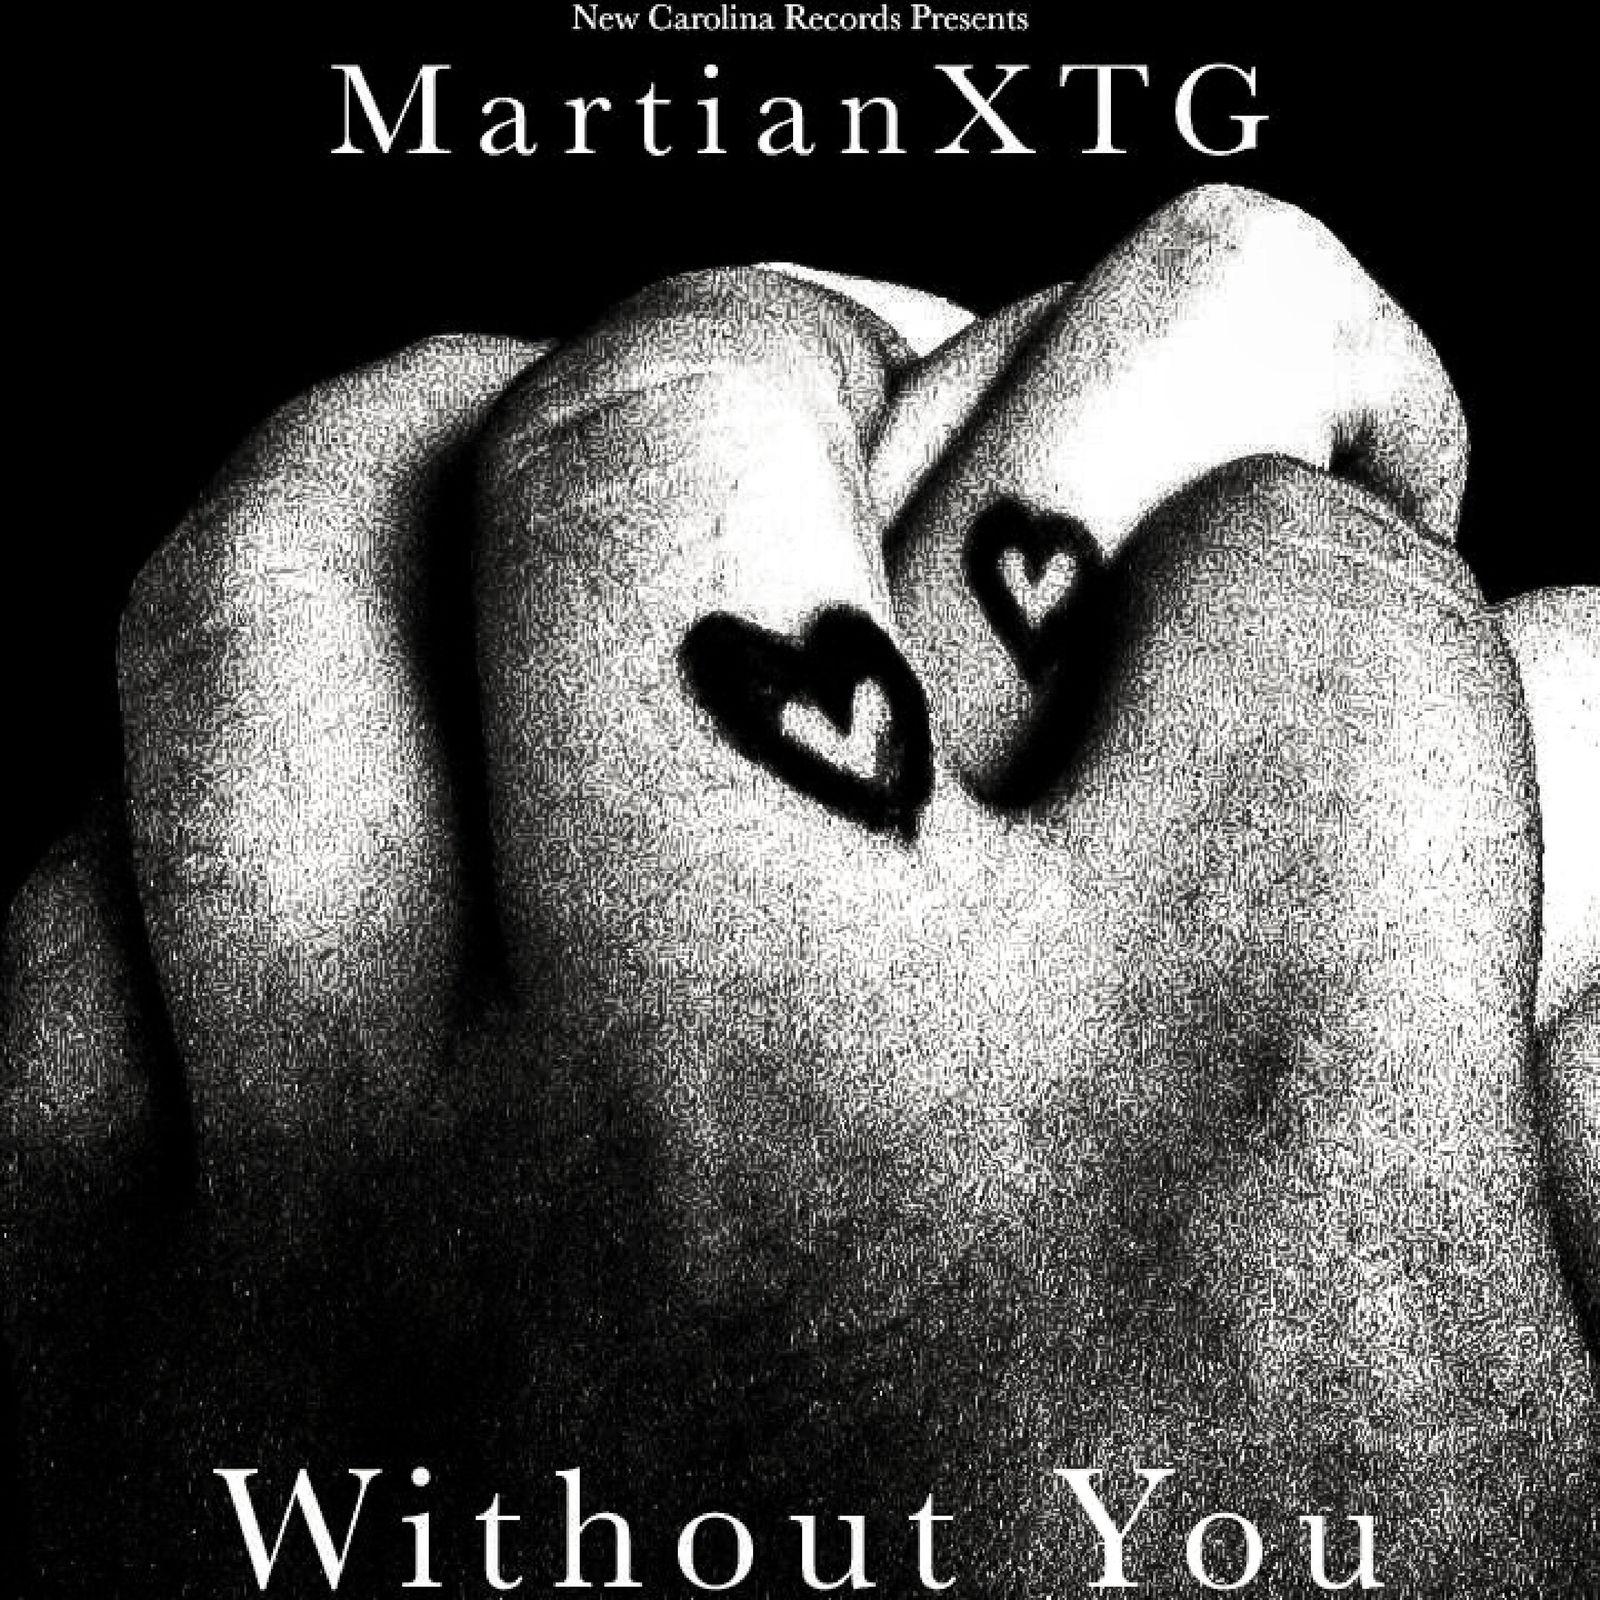 Martianxtg - Without You